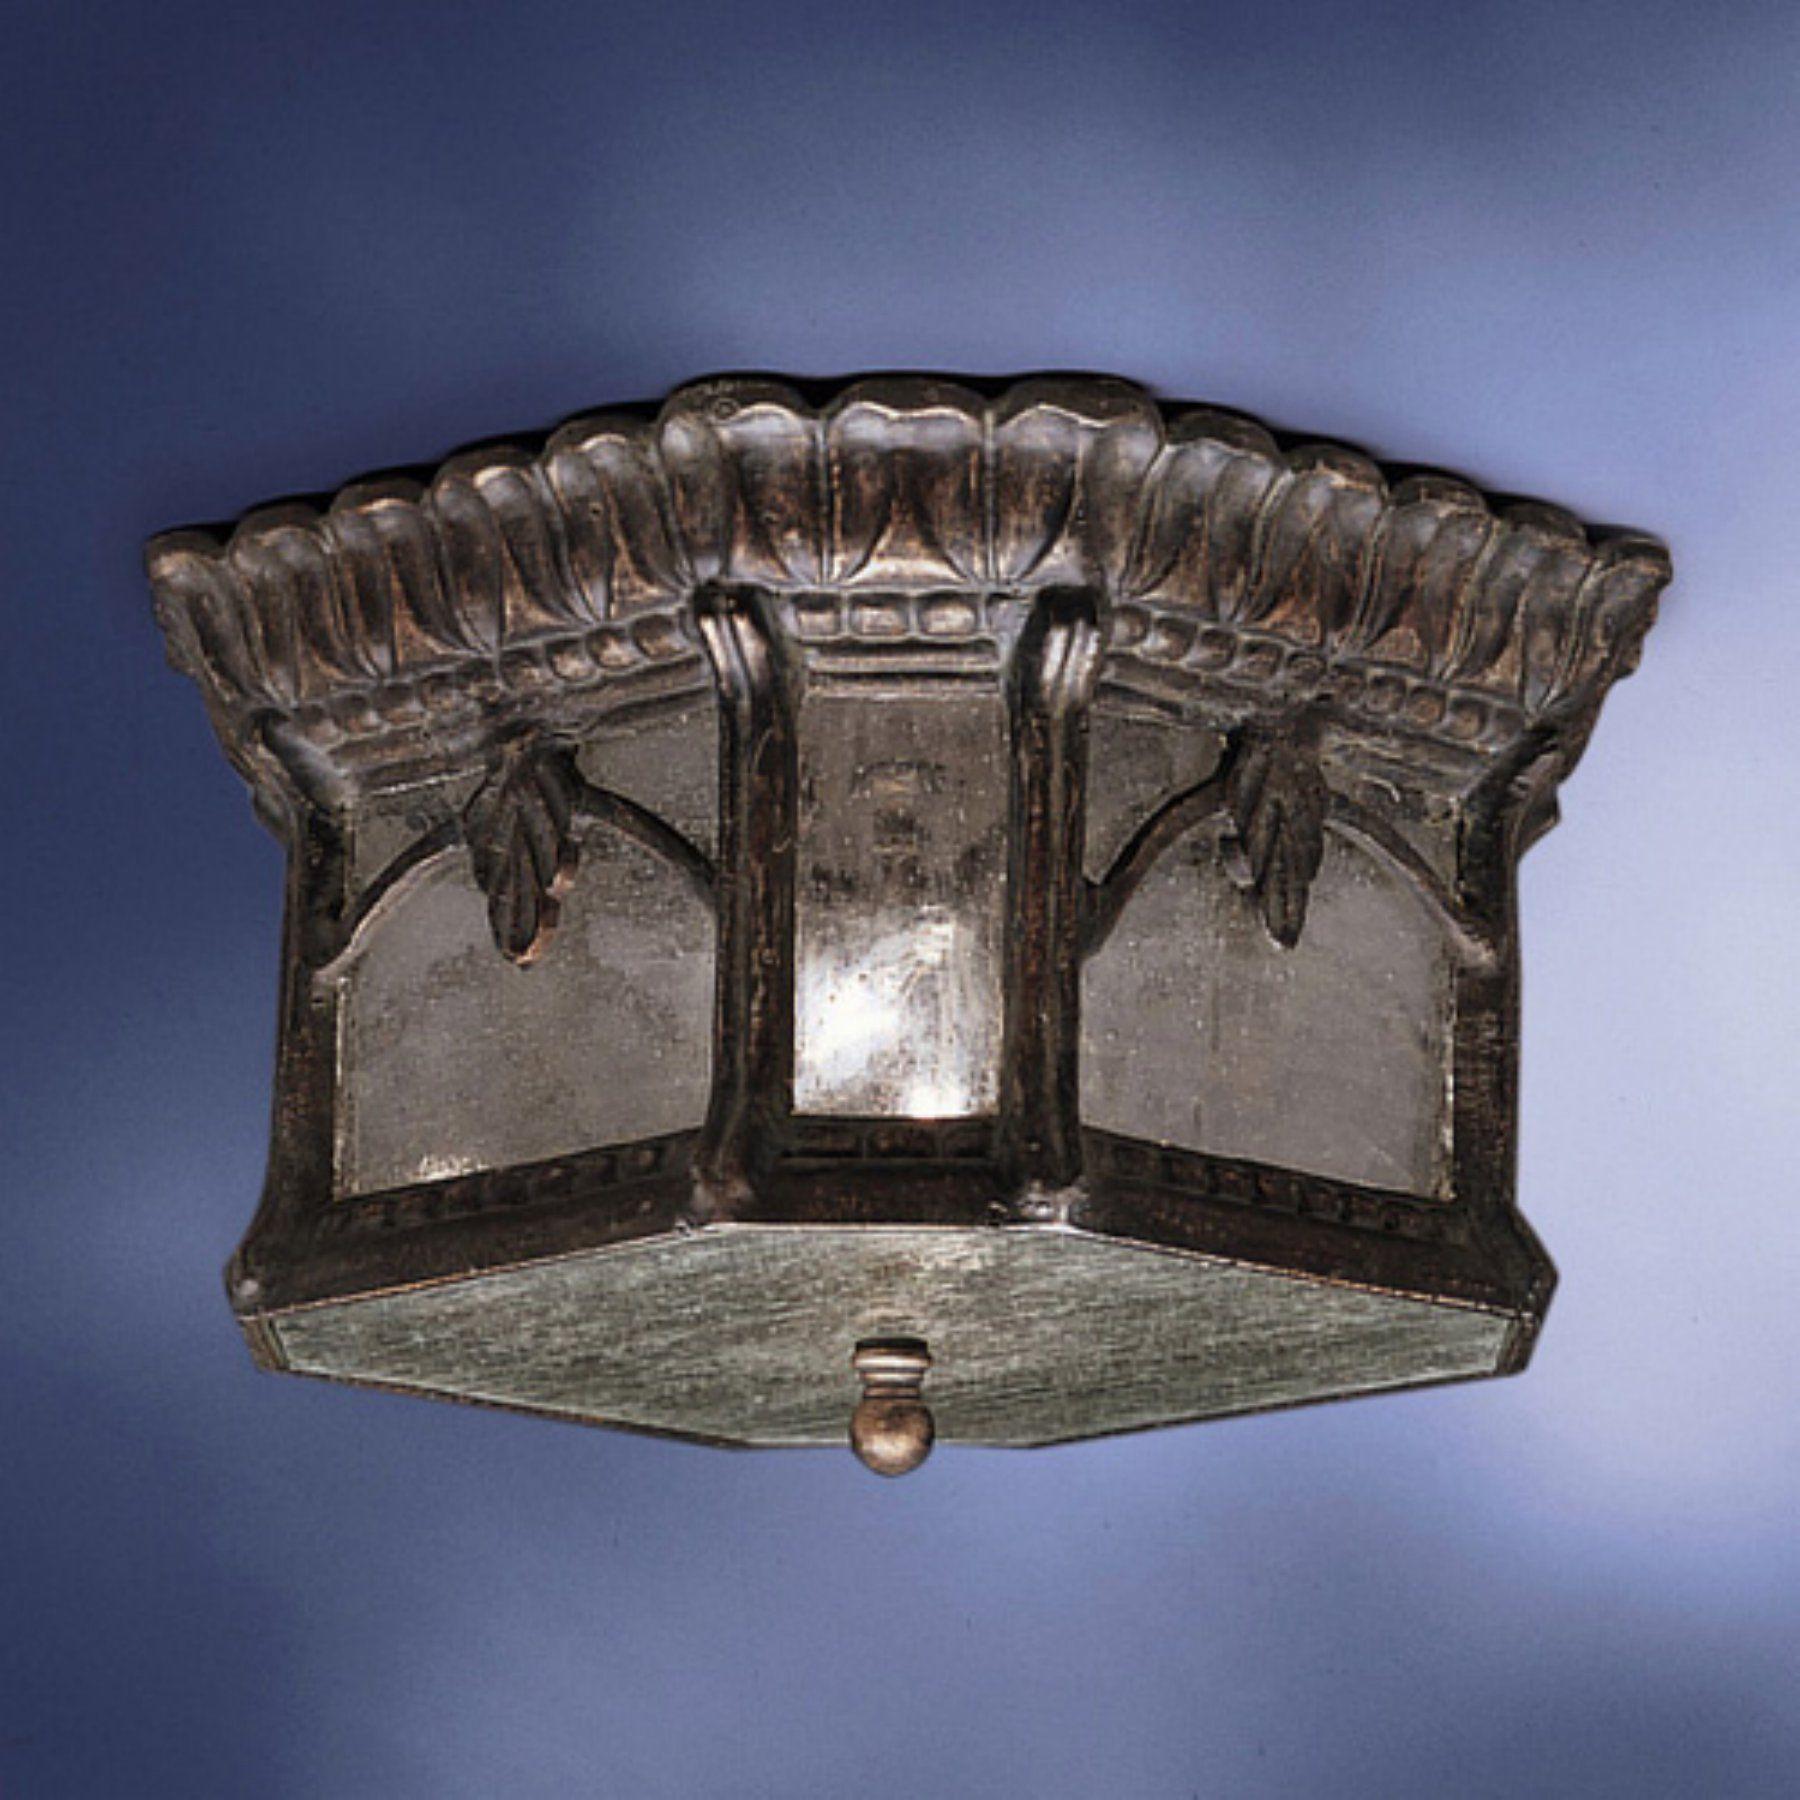 Kichler Tournai 9854 Outdoor Ceiling - 12 in. - 9854LD